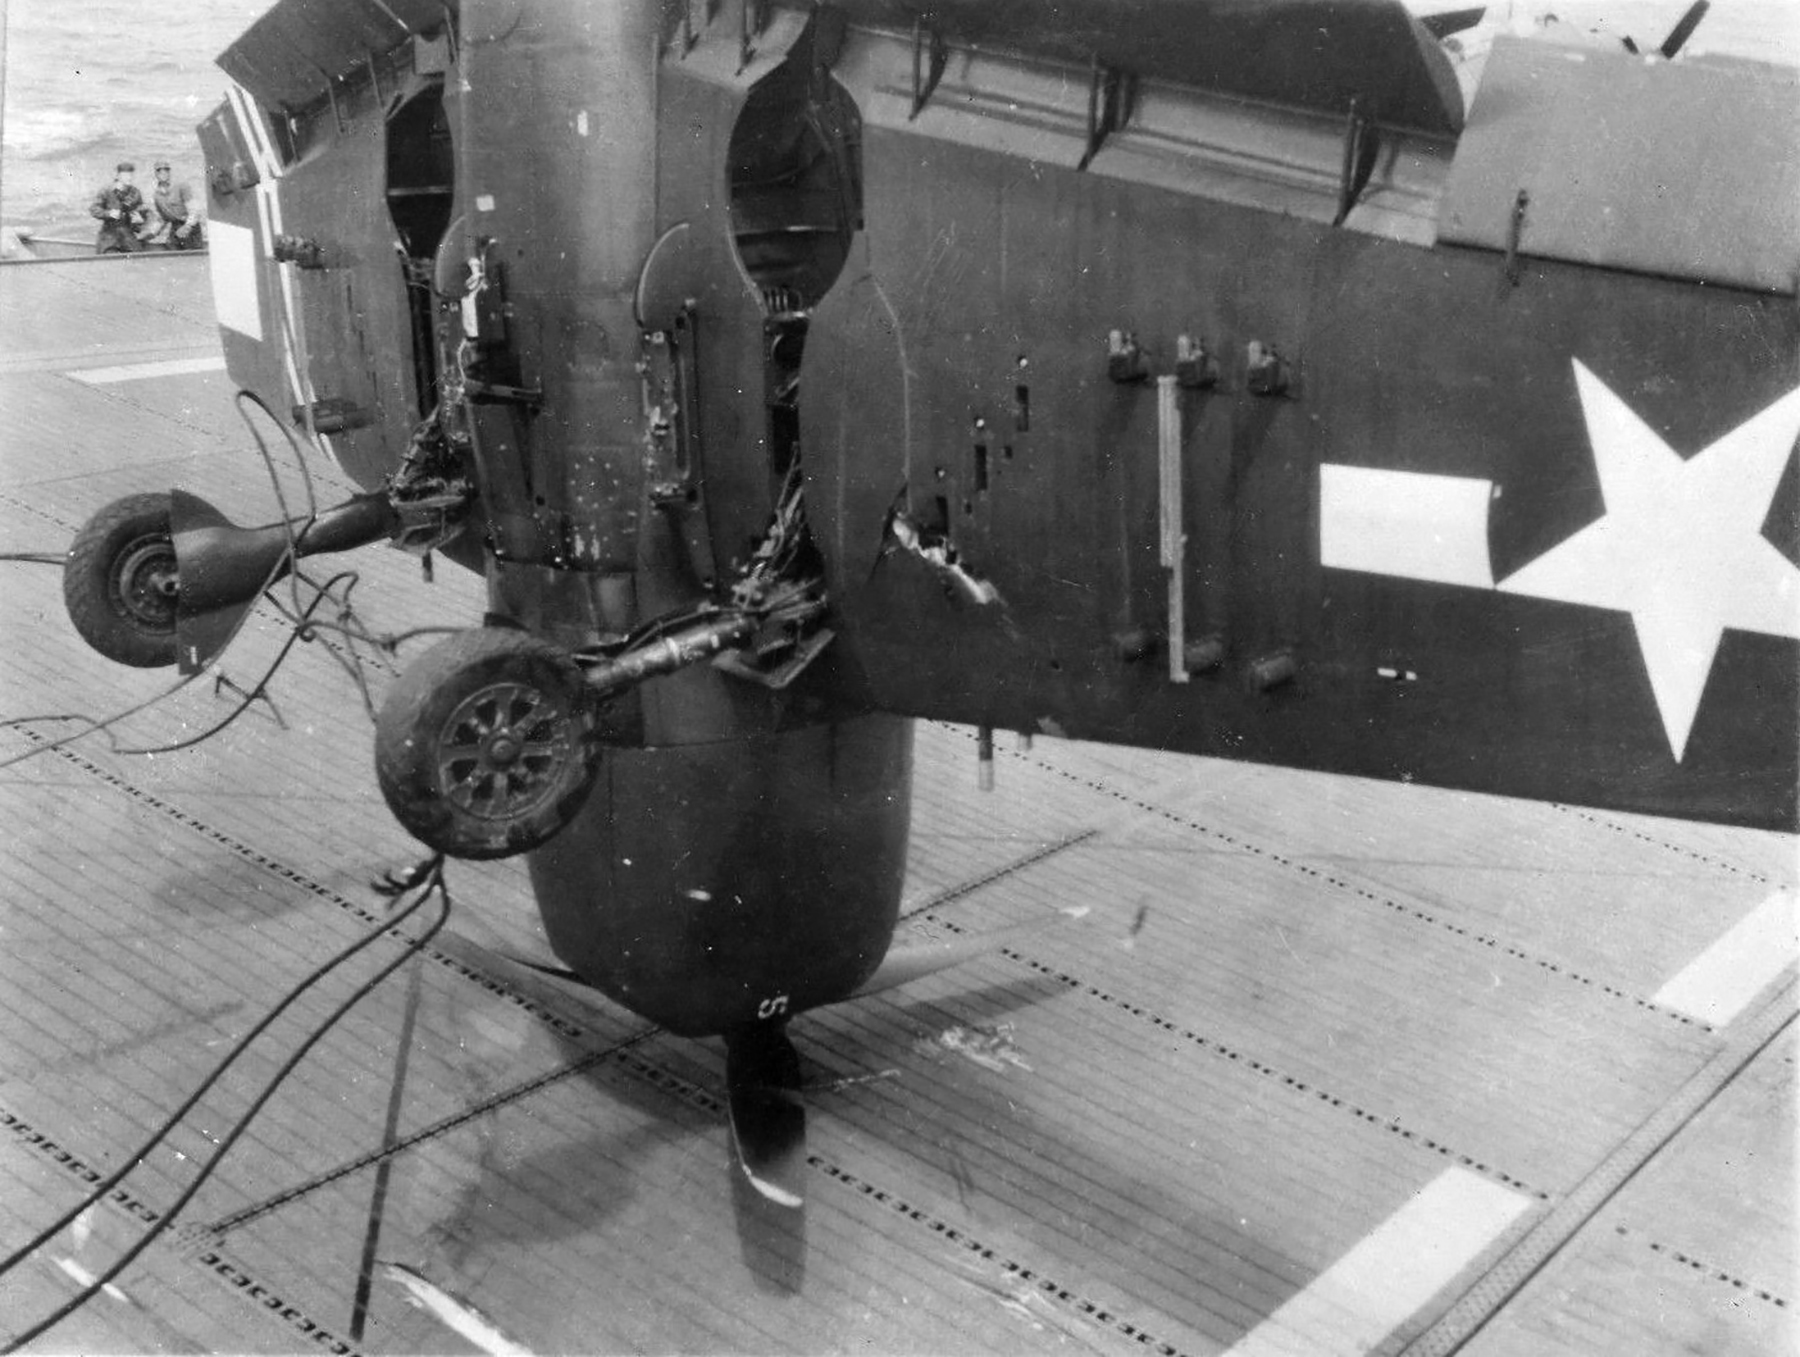 Grumman F6F 5 Hellcat VF 36 White 5 landing mishap CVE 112 USS Siboney Aug 1945 May 1946 05